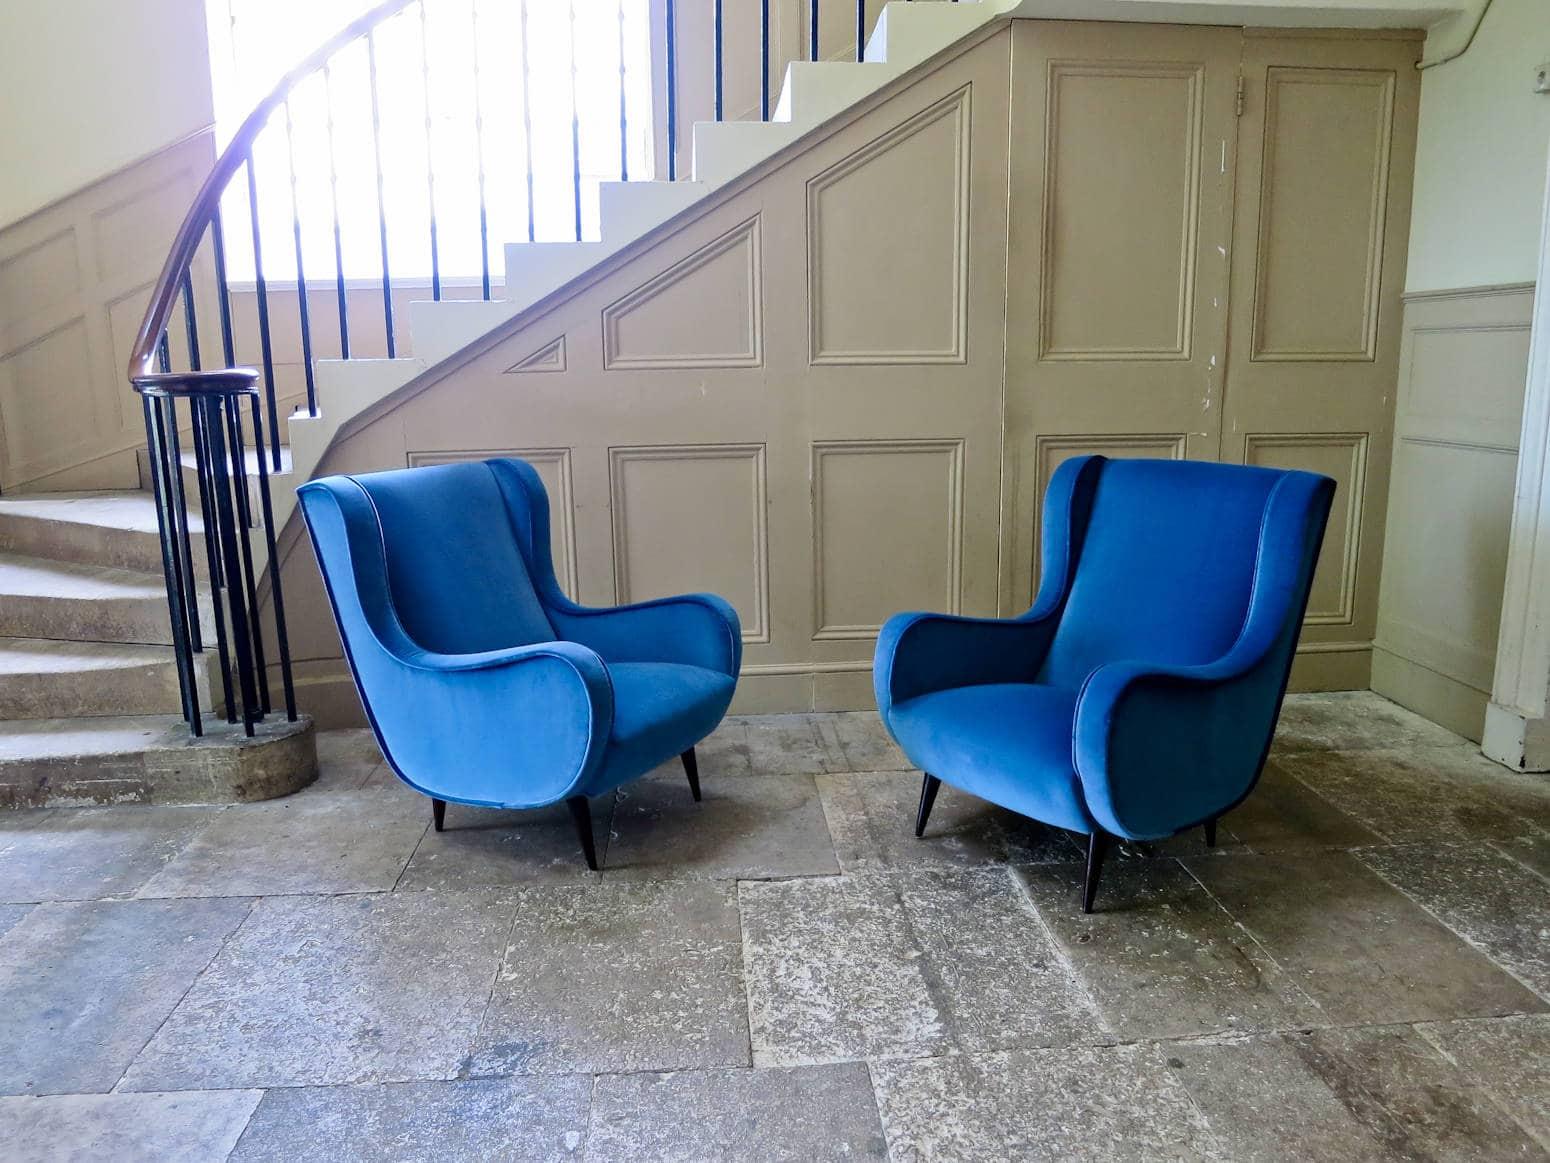 Mid century modern armchairs Marco Zanuso style Italian 1950's